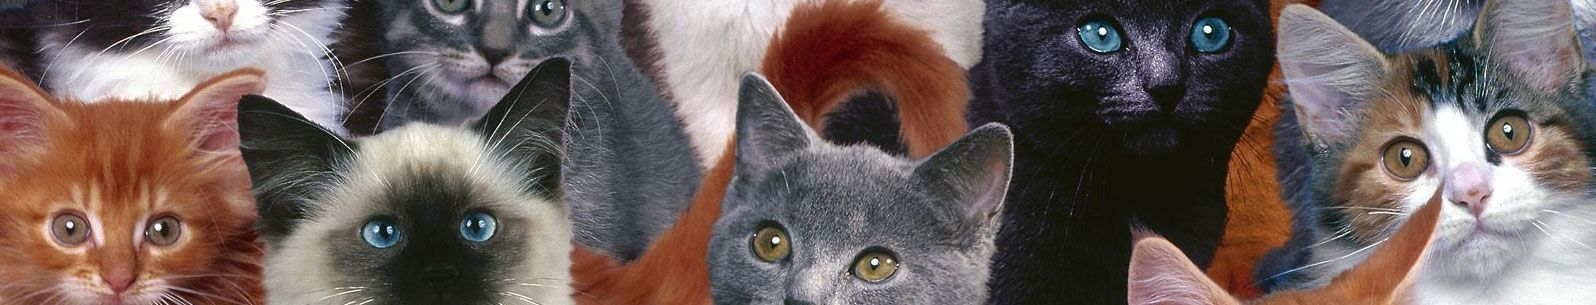 banner-many-cats.jpg